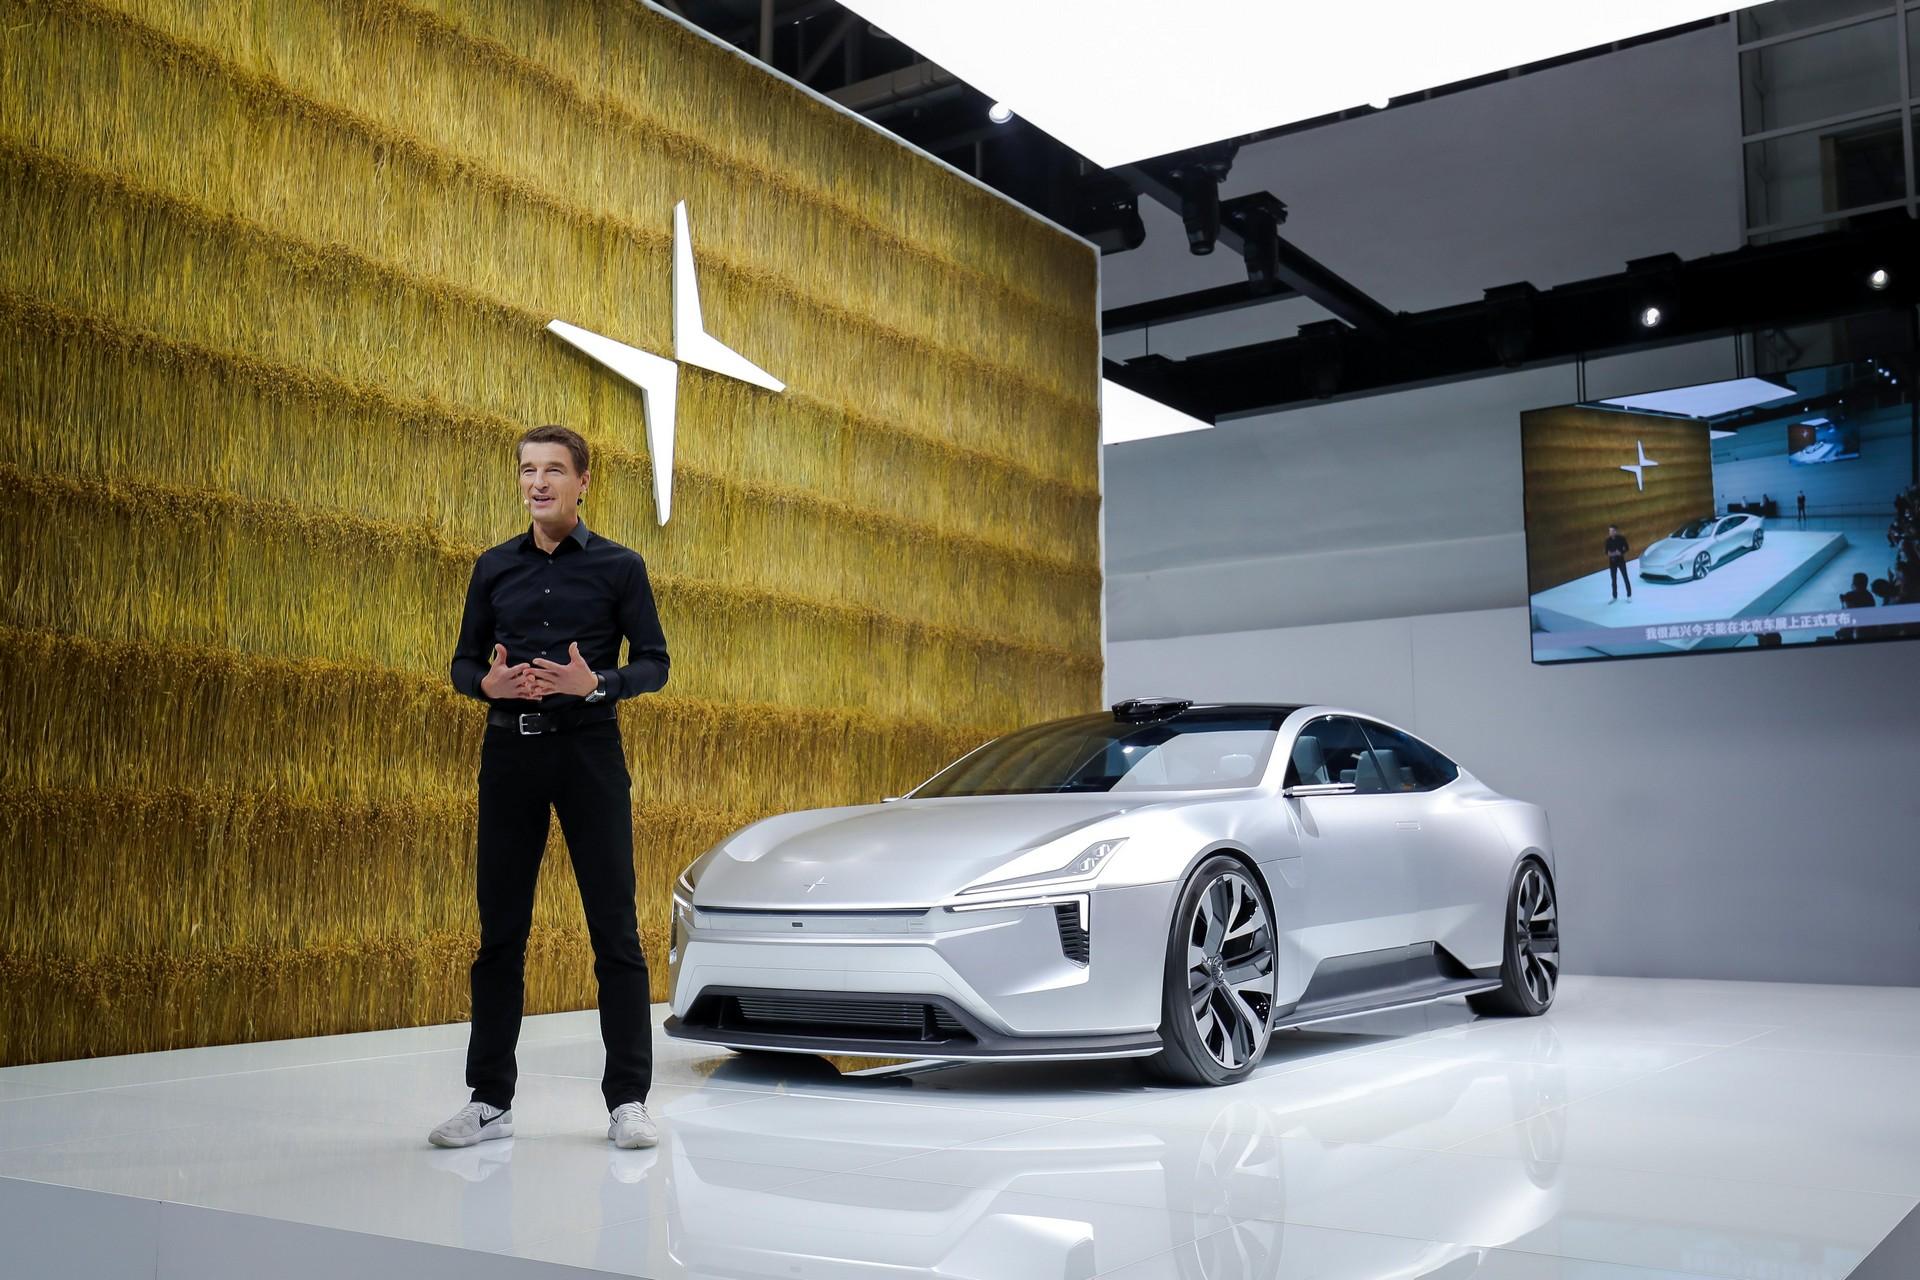 New Polestar EV Confirmed, Precept Concept Entering Production